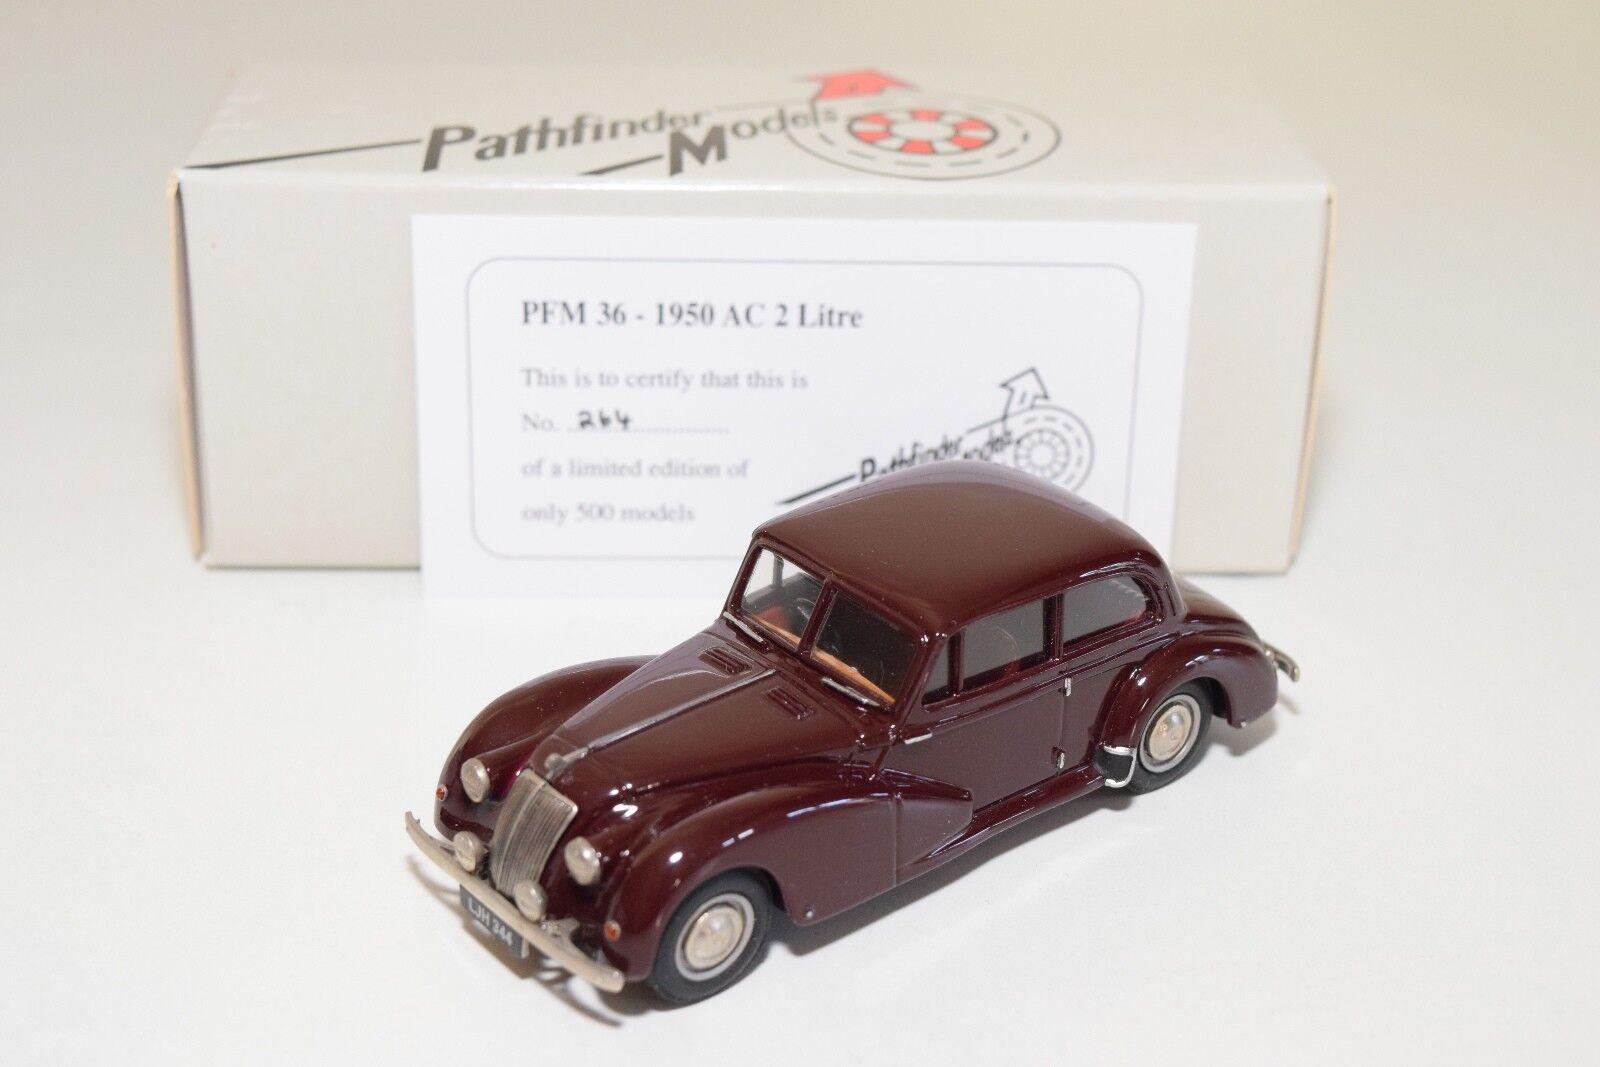 PATHFENDER modelllllerLER PFM36 PFM 36 1950 AC 2 LITRE MAROON MINT lådaED 264  500